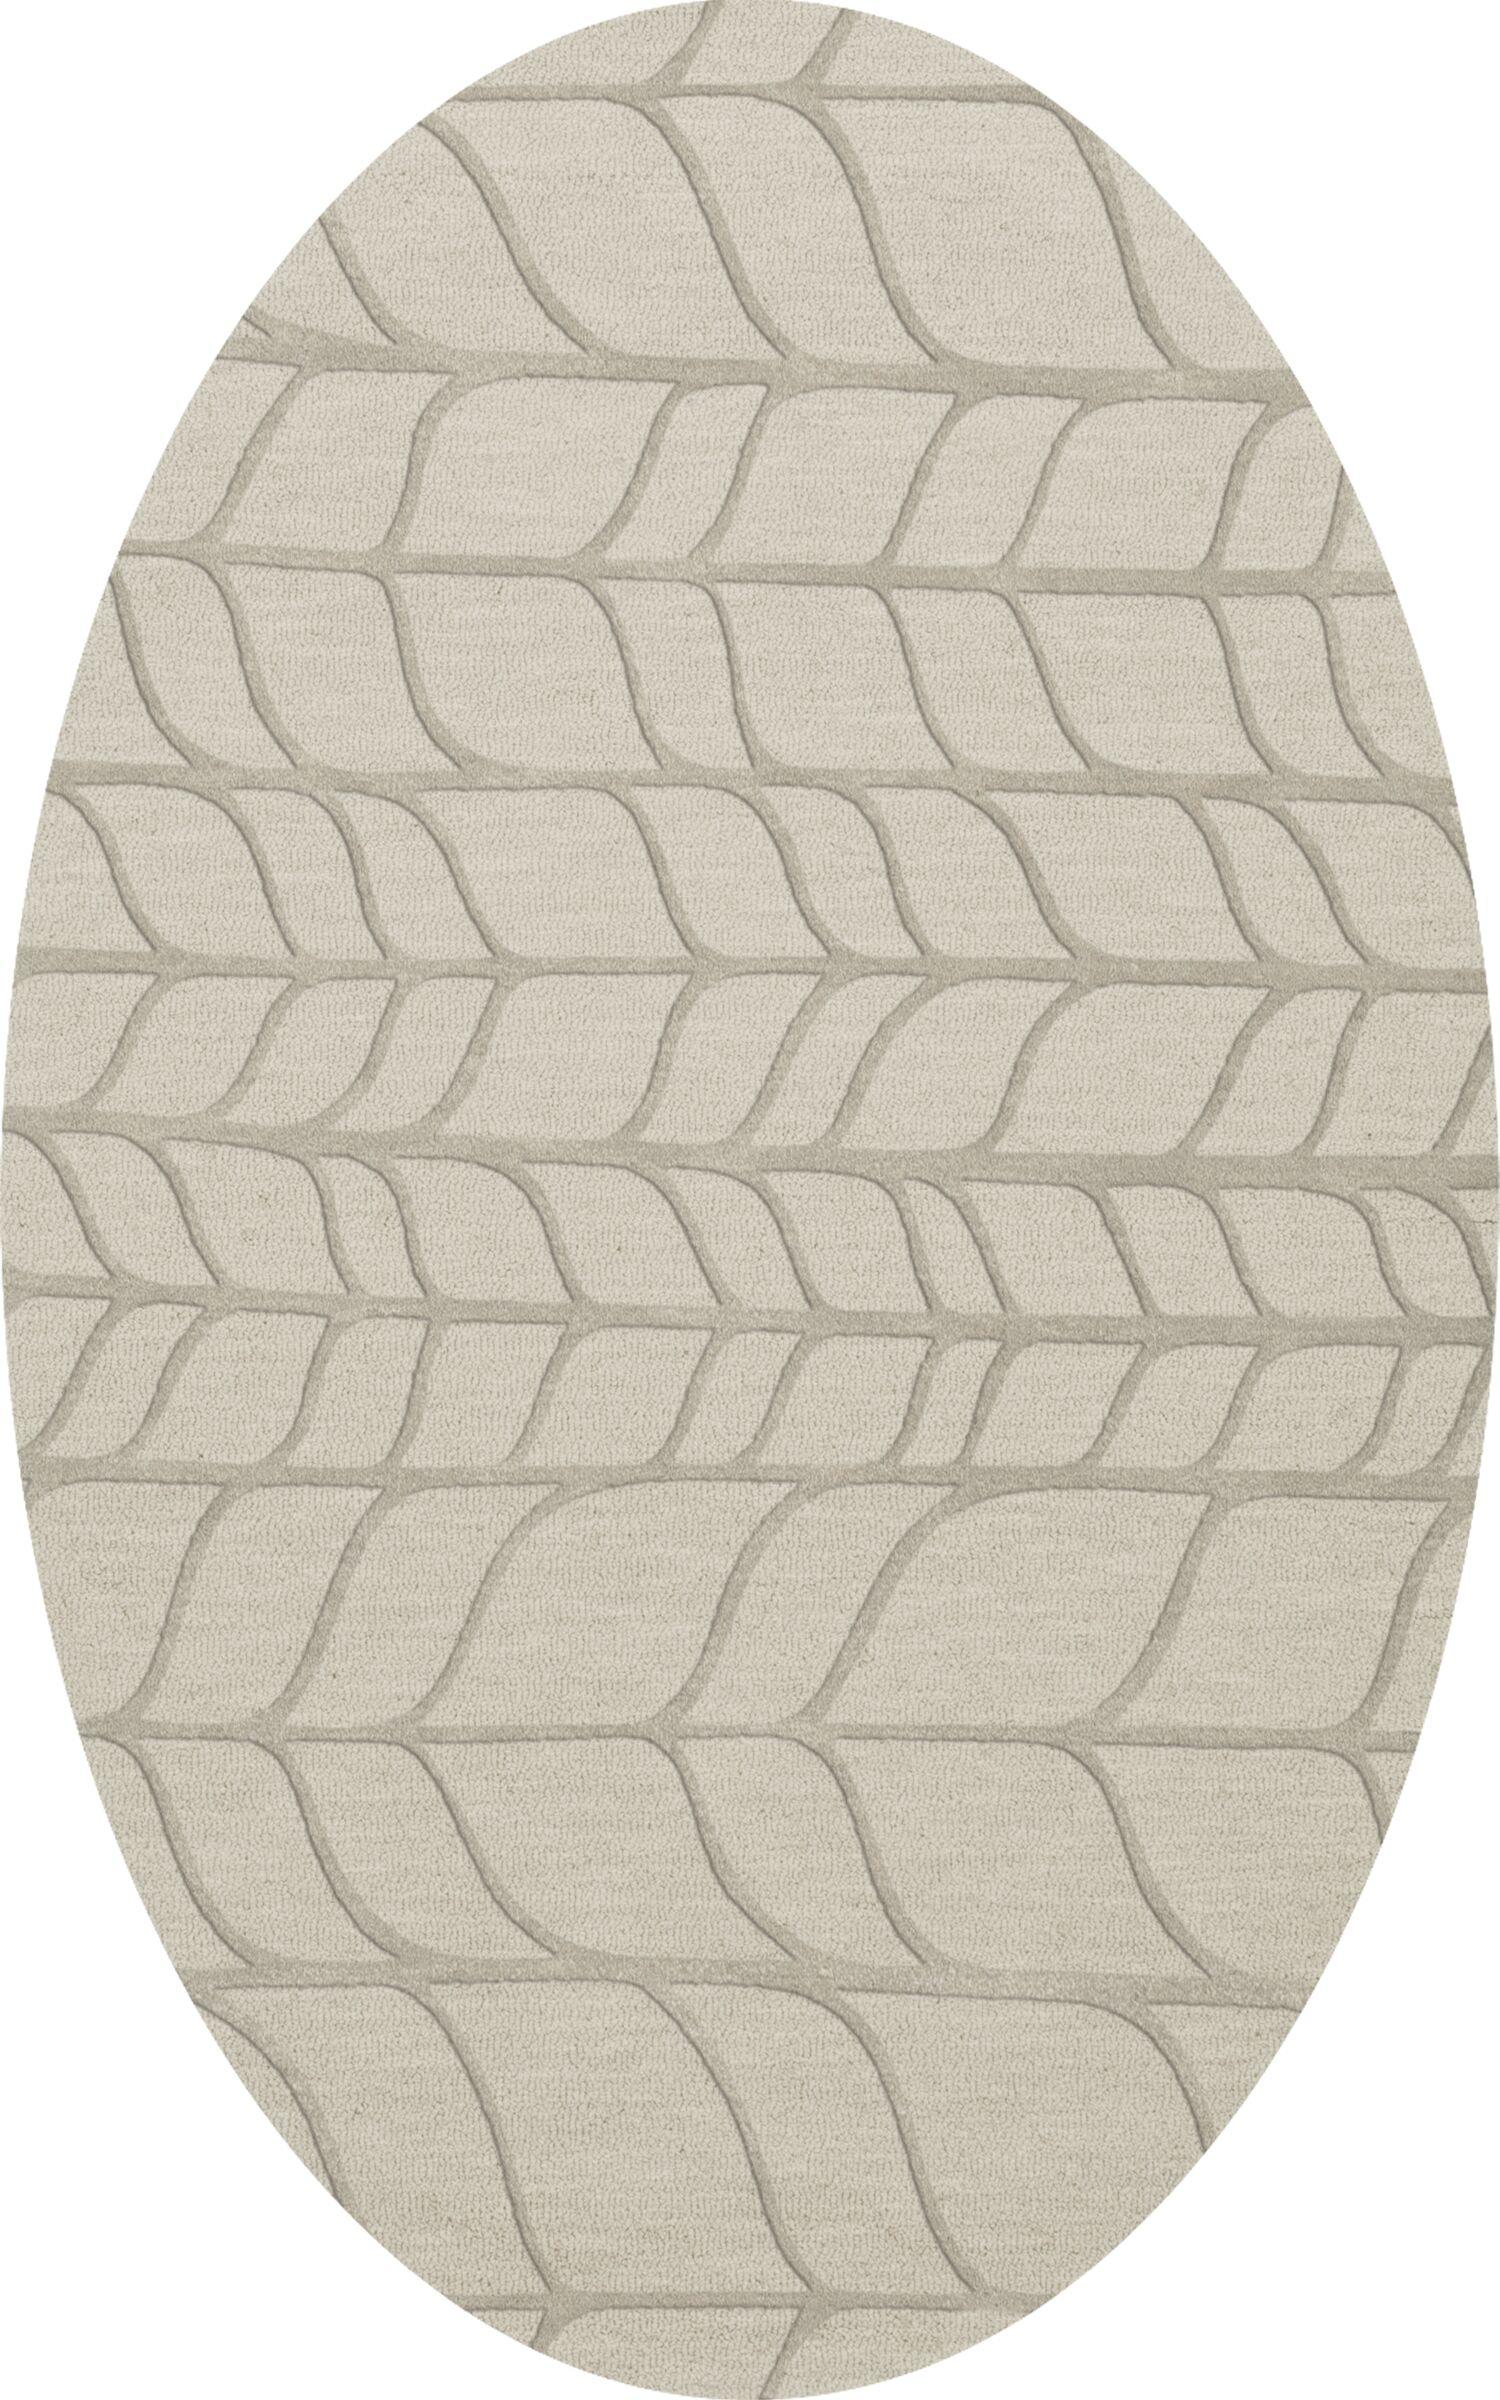 Bella Machine Woven Wool Gray Area Rug Rug Size: Oval 12' x 15'